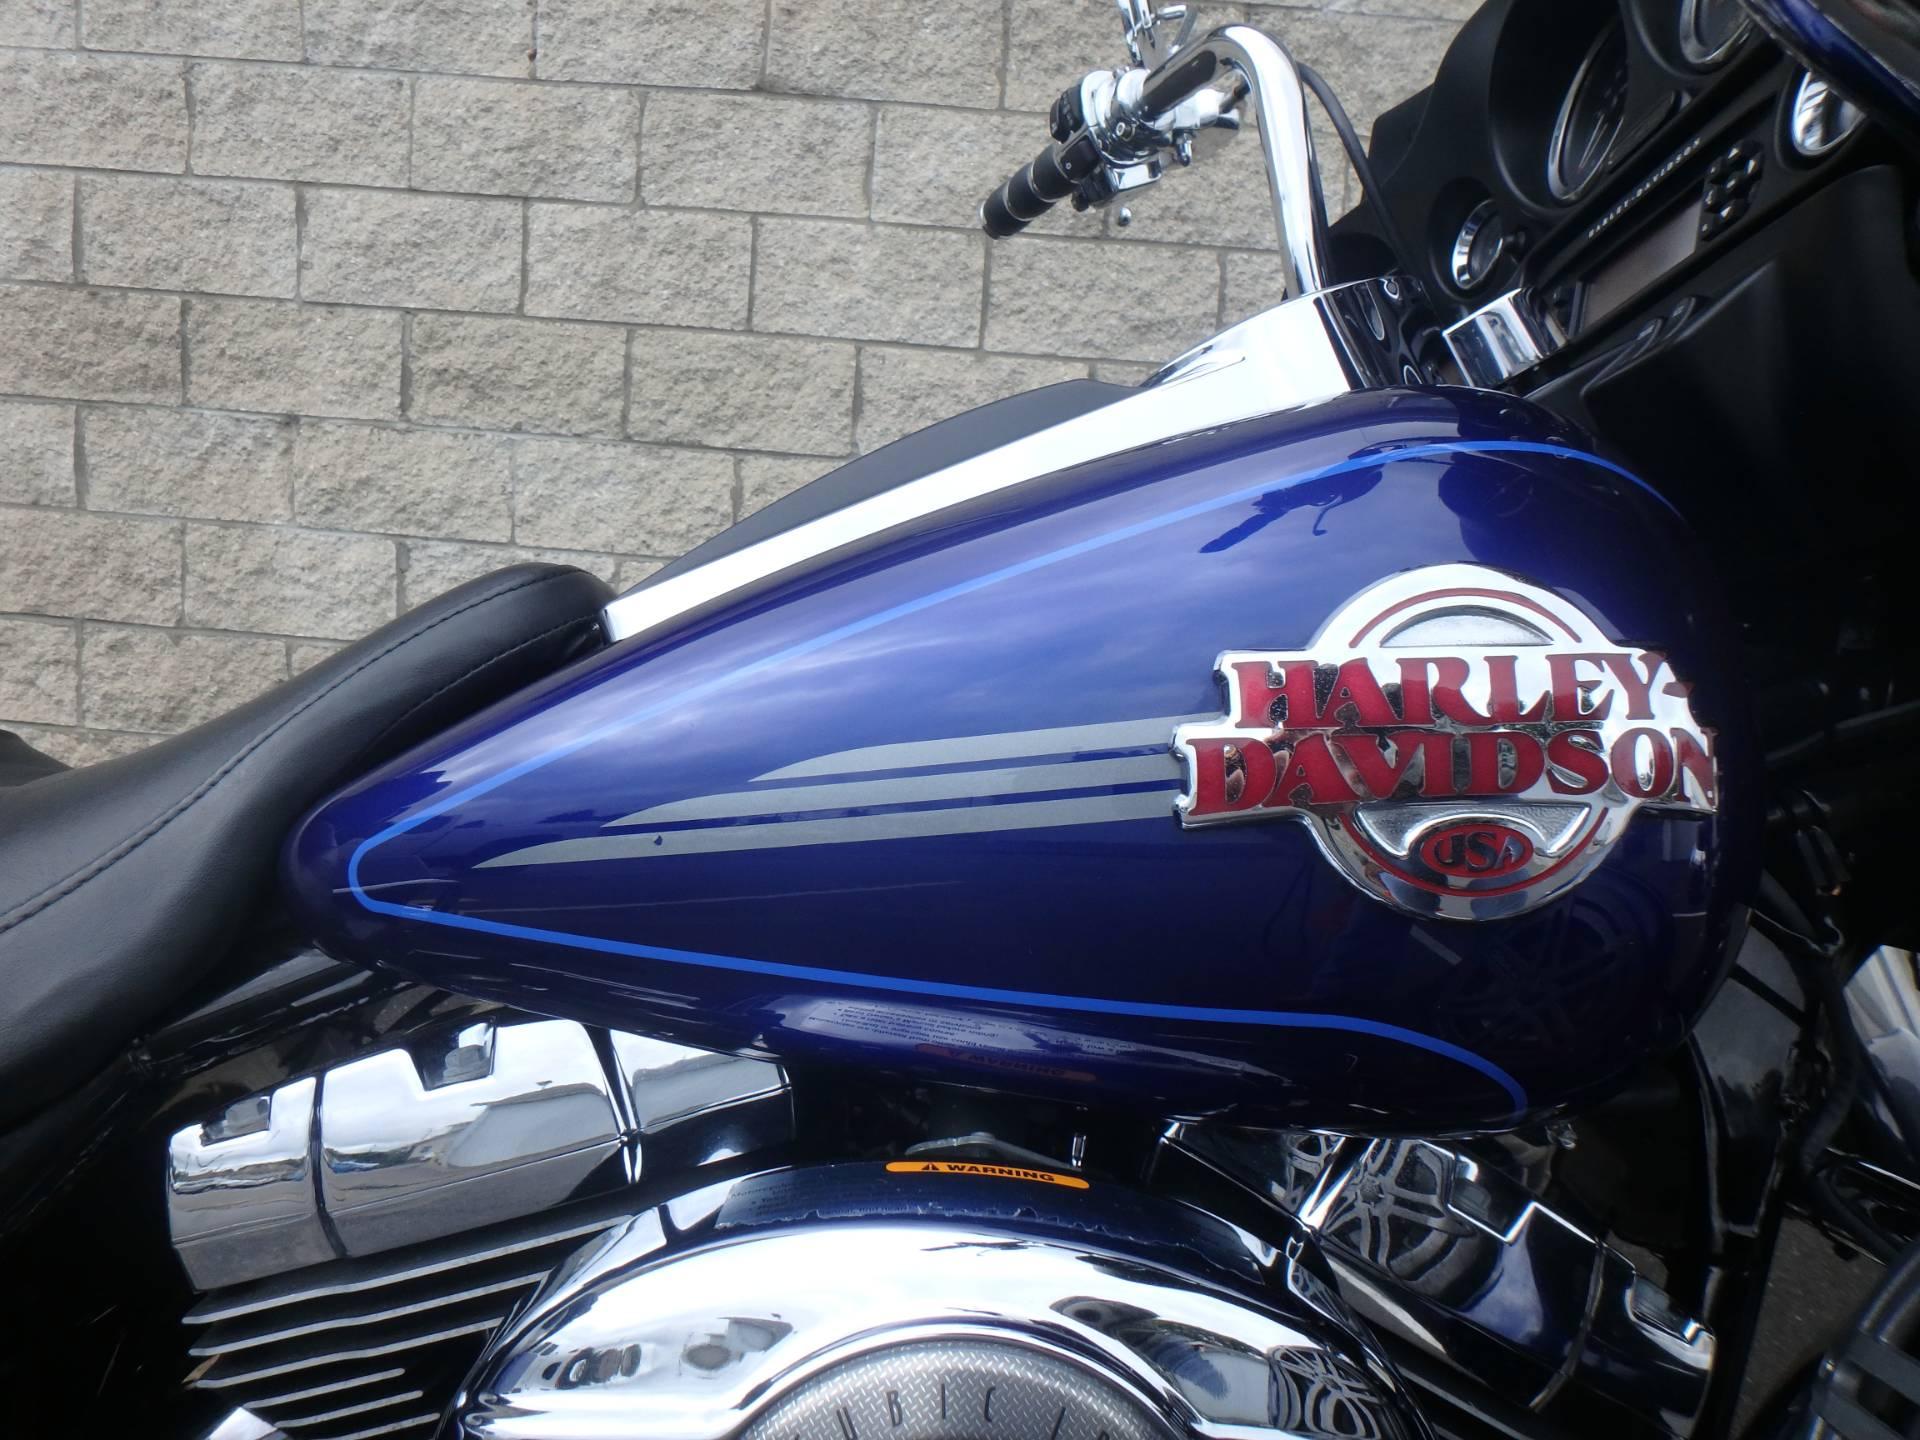 2007 Harley-Davidson Ultra Classic Electra Glide 5